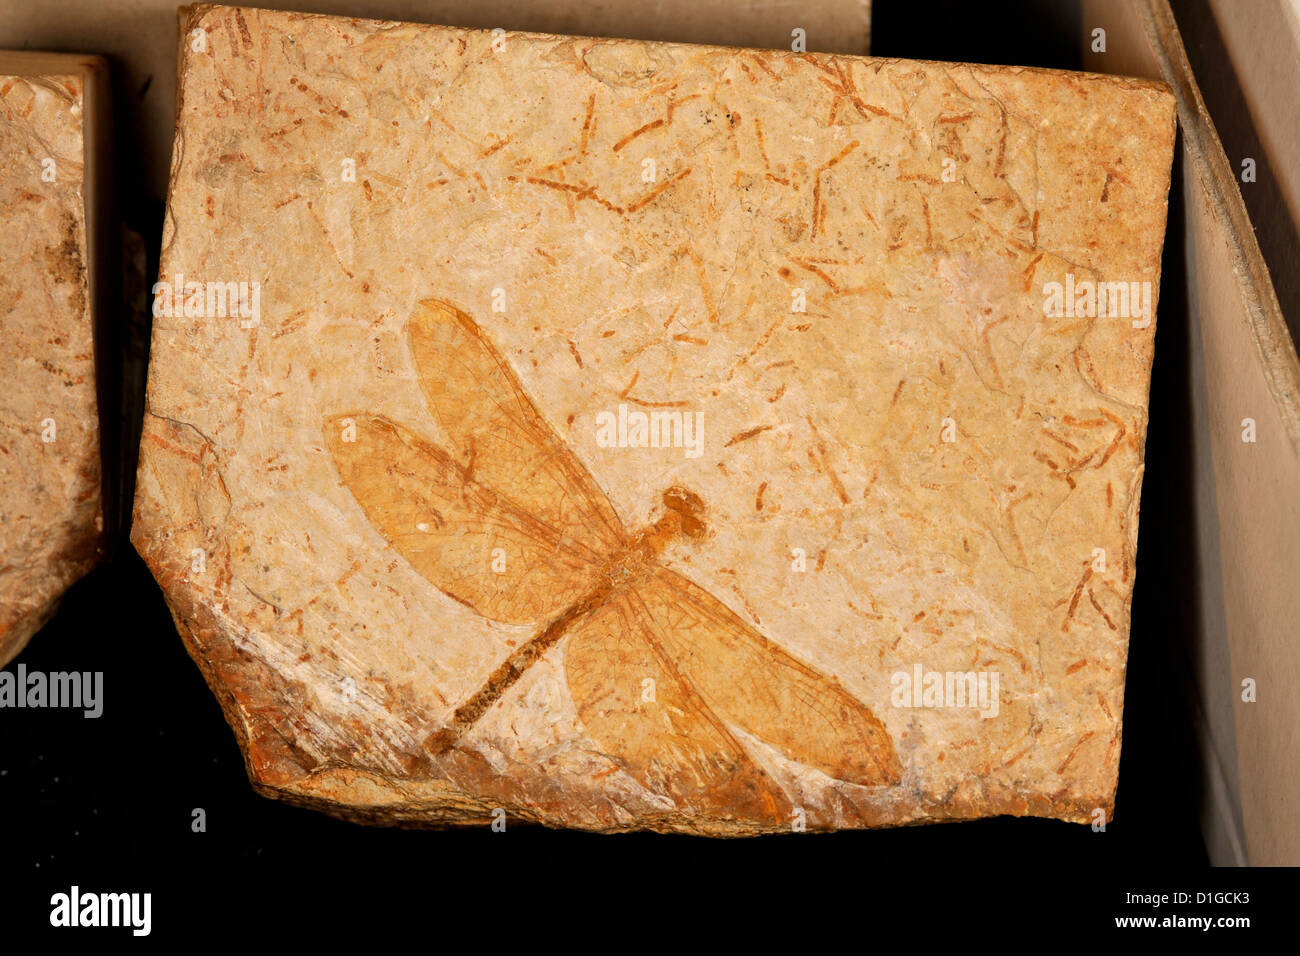 Libélula fósil, Odonata, Período Cretácico, Grado, Italia Foto de stock